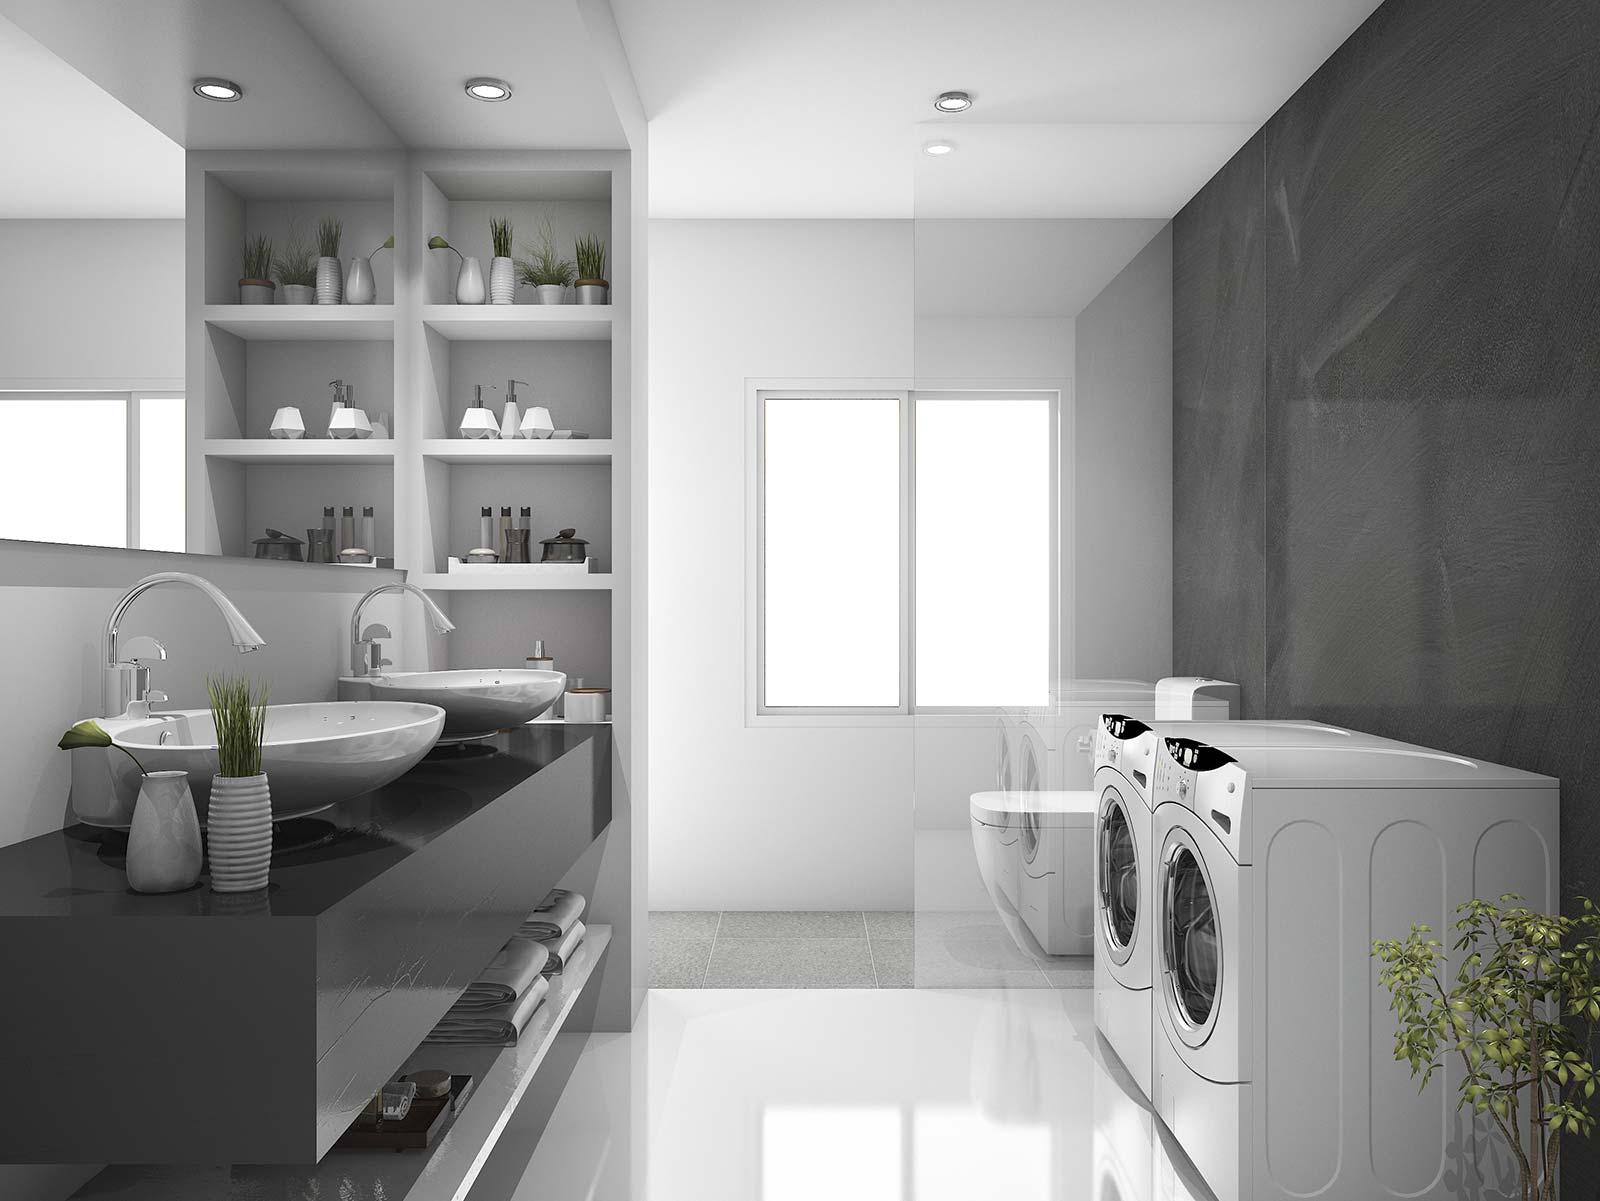 AJM-Plumbers_Melbourne_Australia_laundry-plumbing